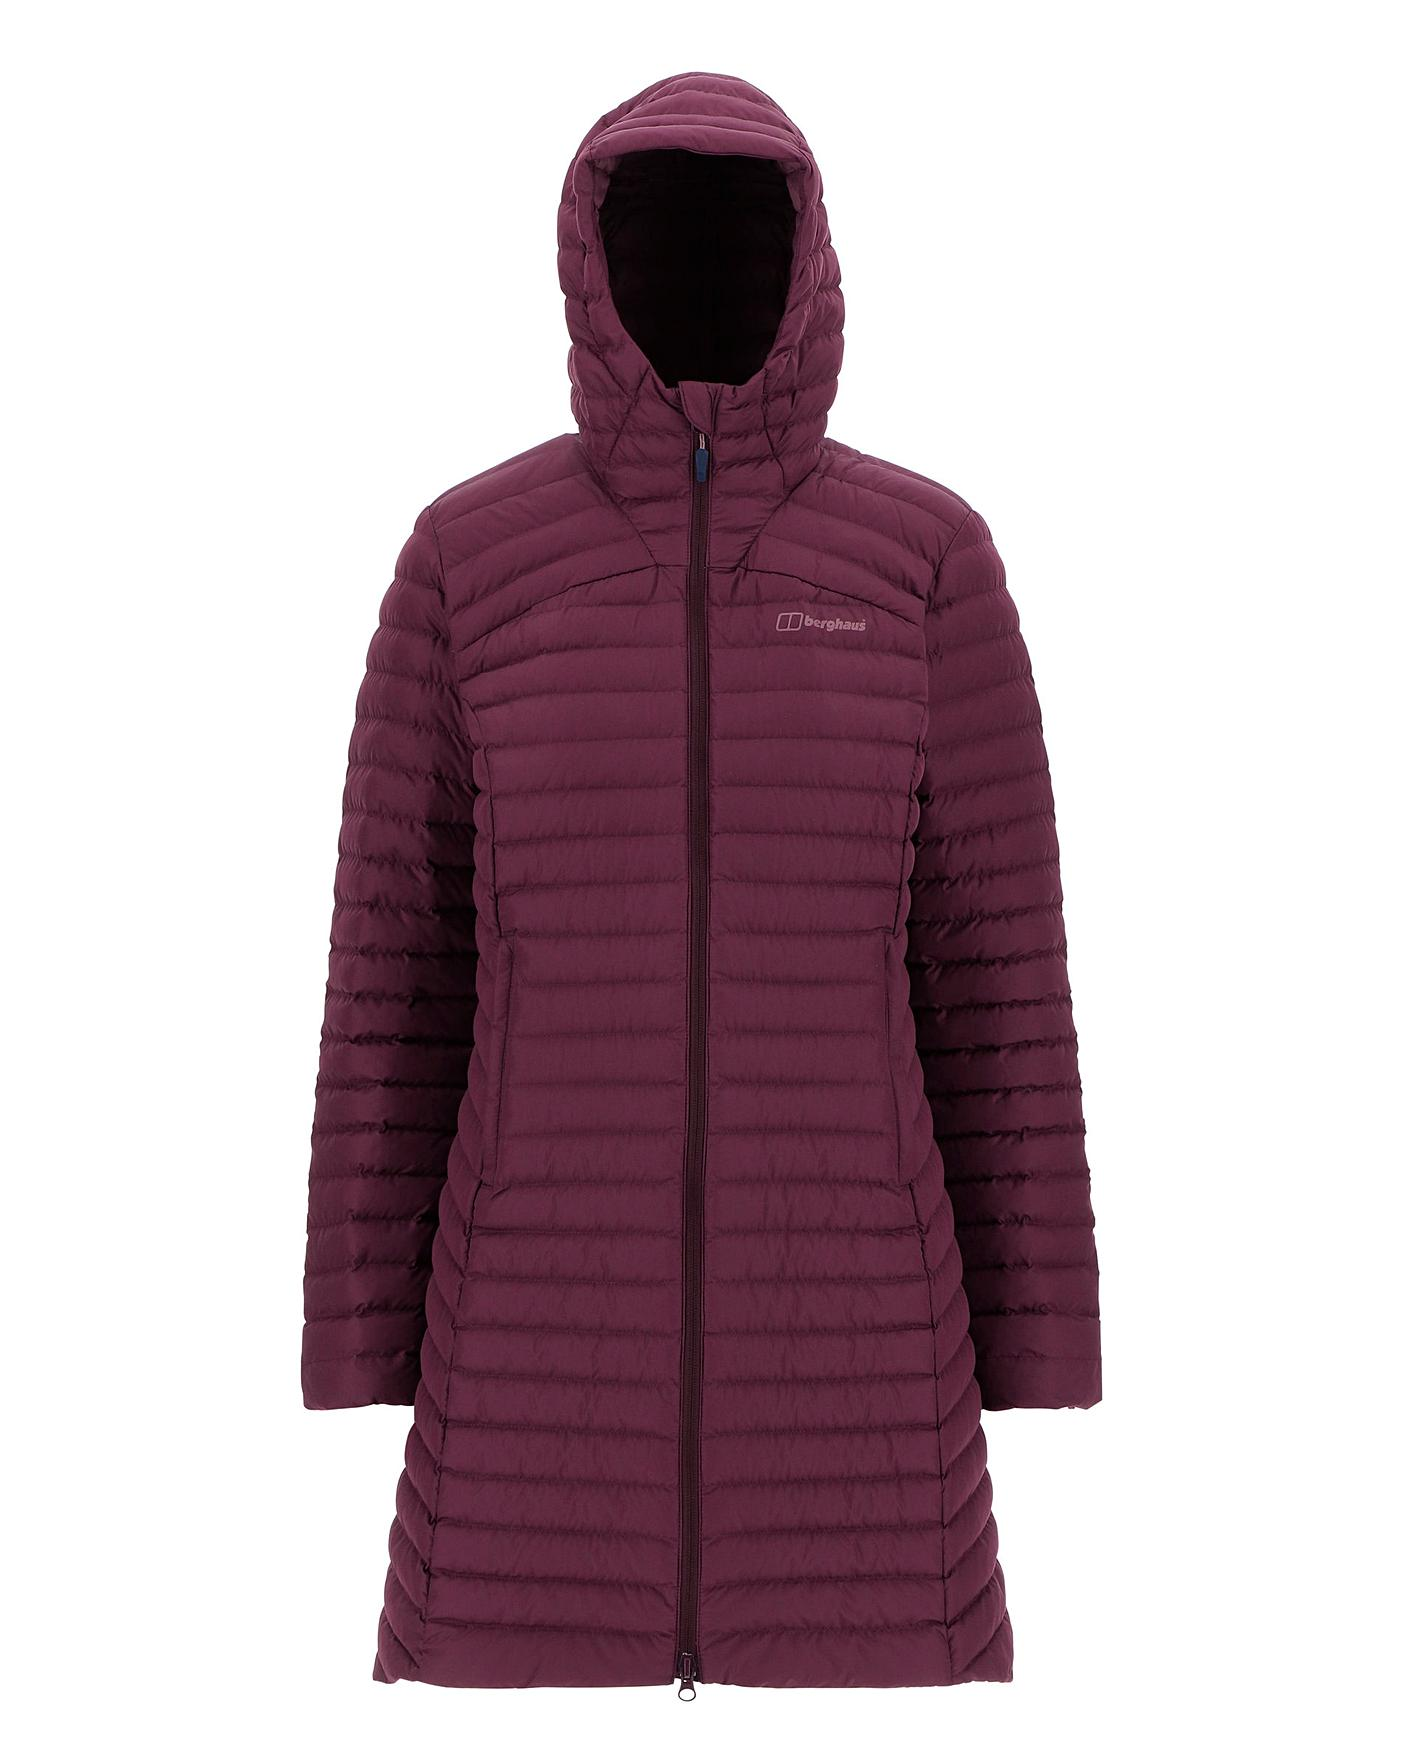 online retailer a70b3 38465 Berghaus Nula Micro Long Jacket